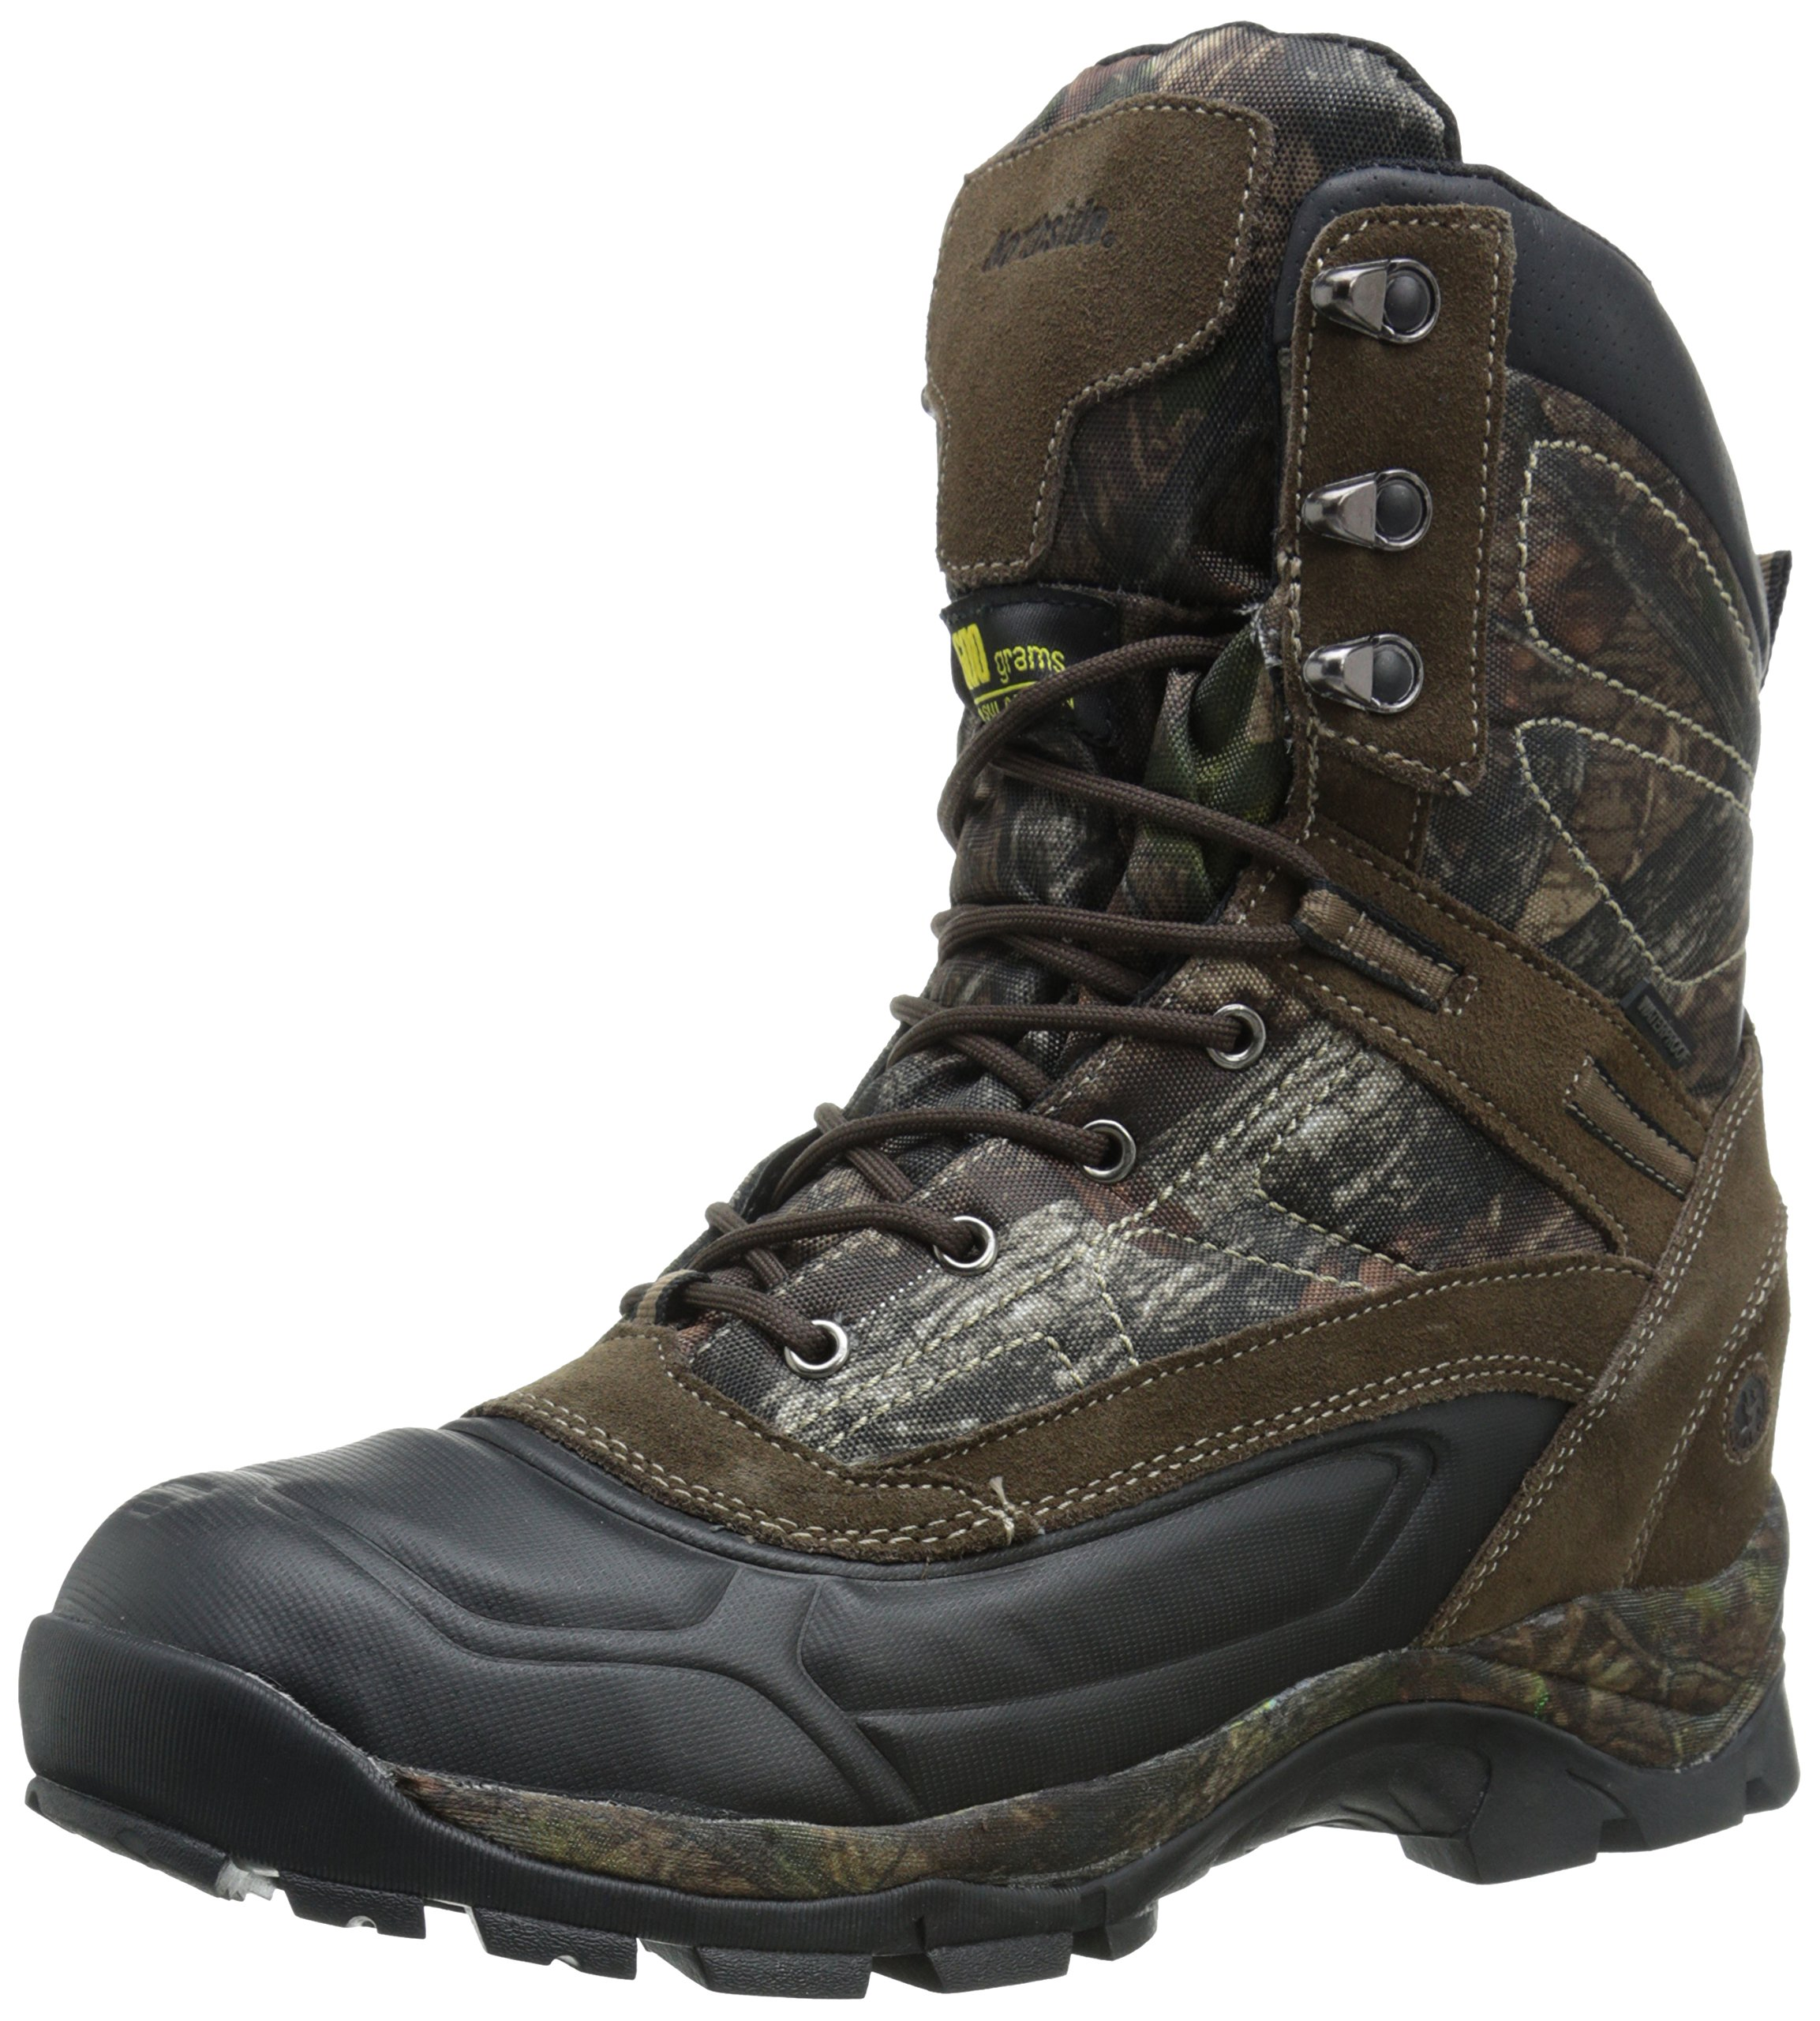 Northside Men's Banshee 600 Hunting Boot, Brown Camo, 7 M US